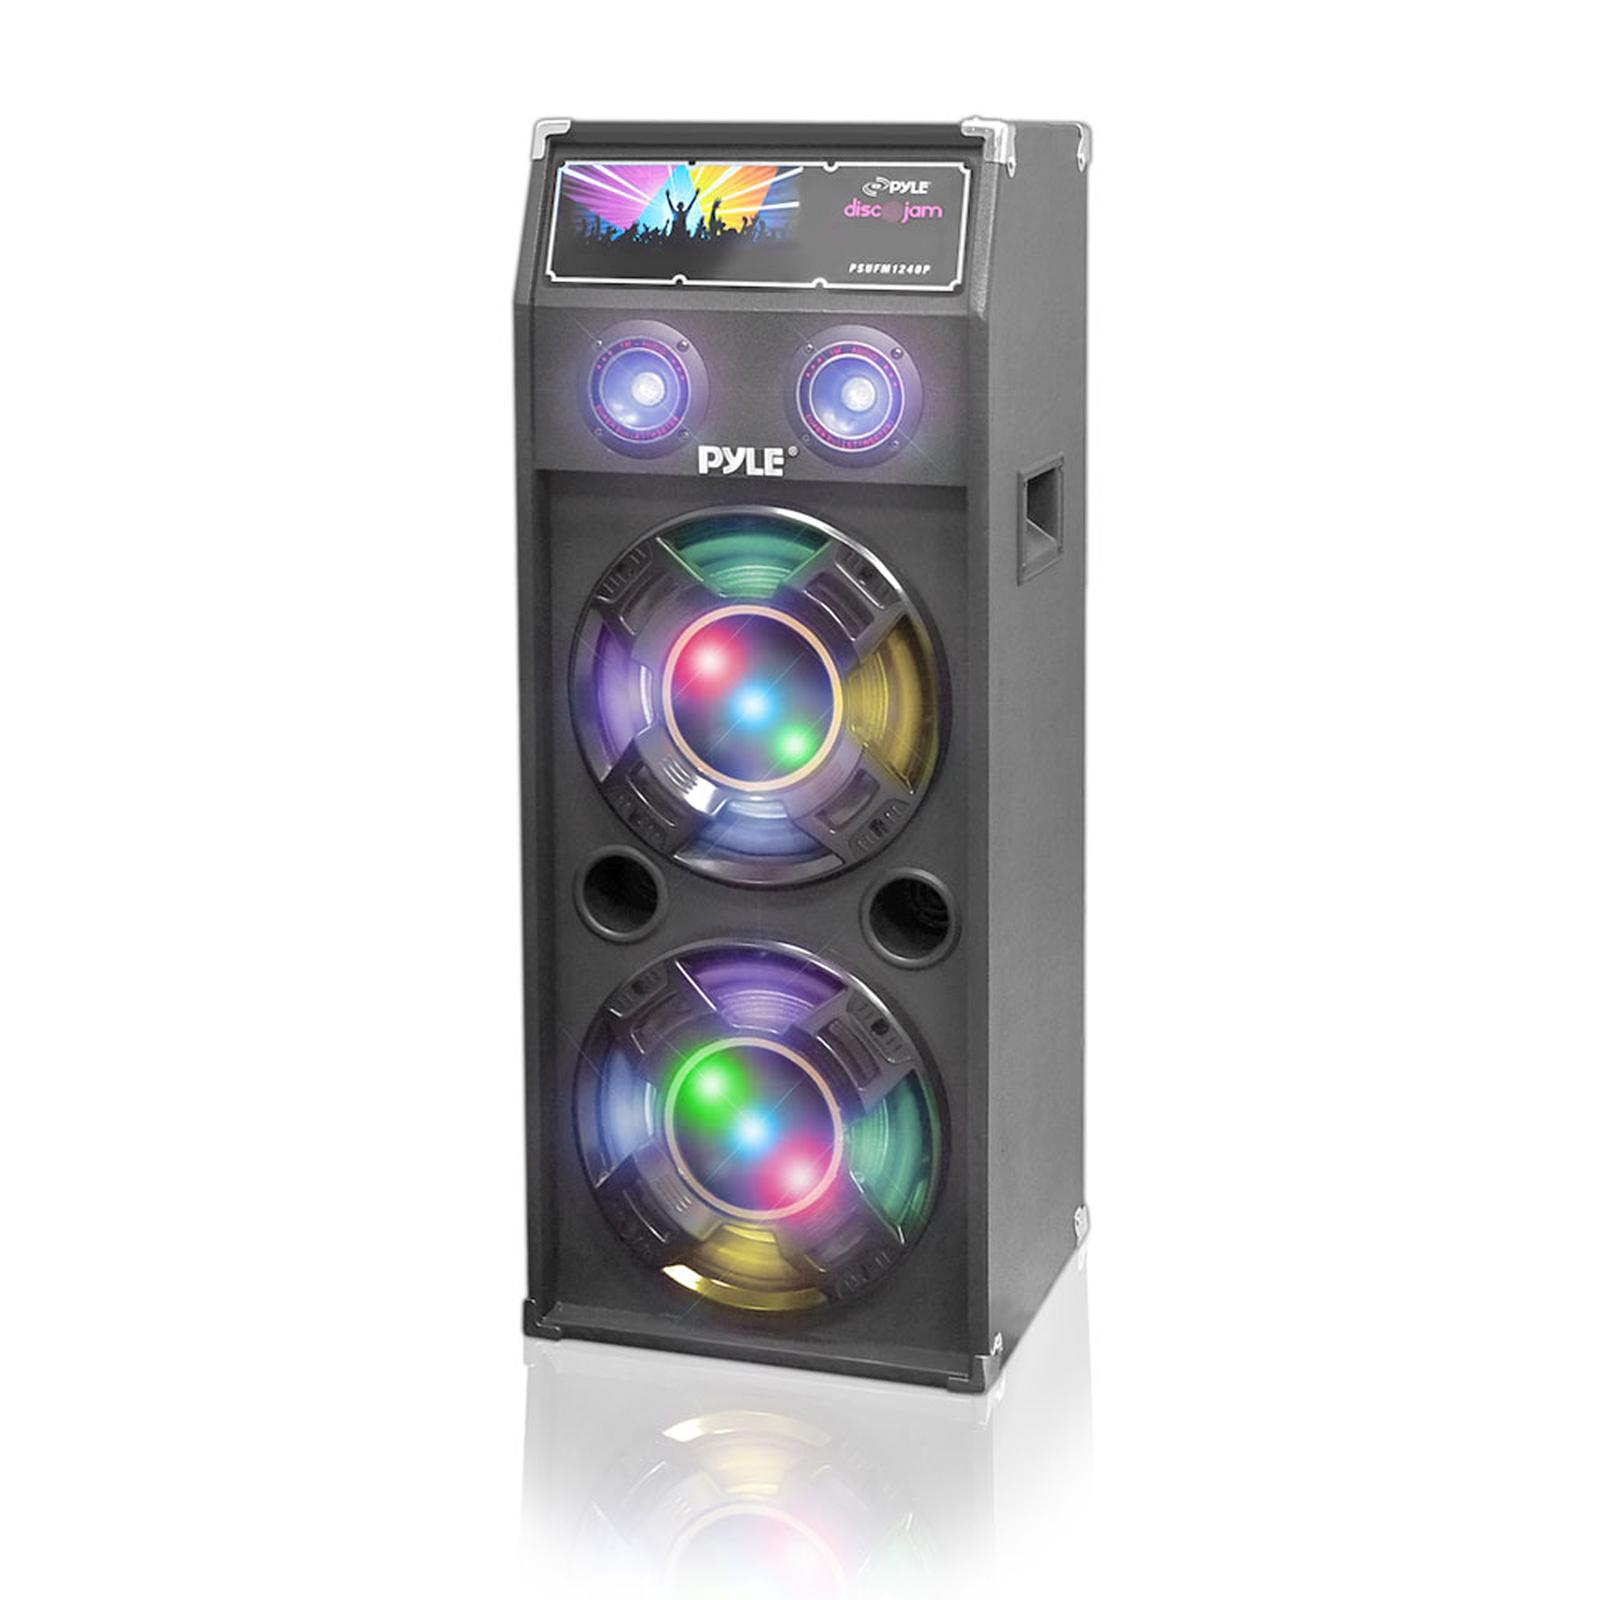 Pyle 1400 Watt Disco Jam Dual Passive DJ Speaker System with Flashing DJ